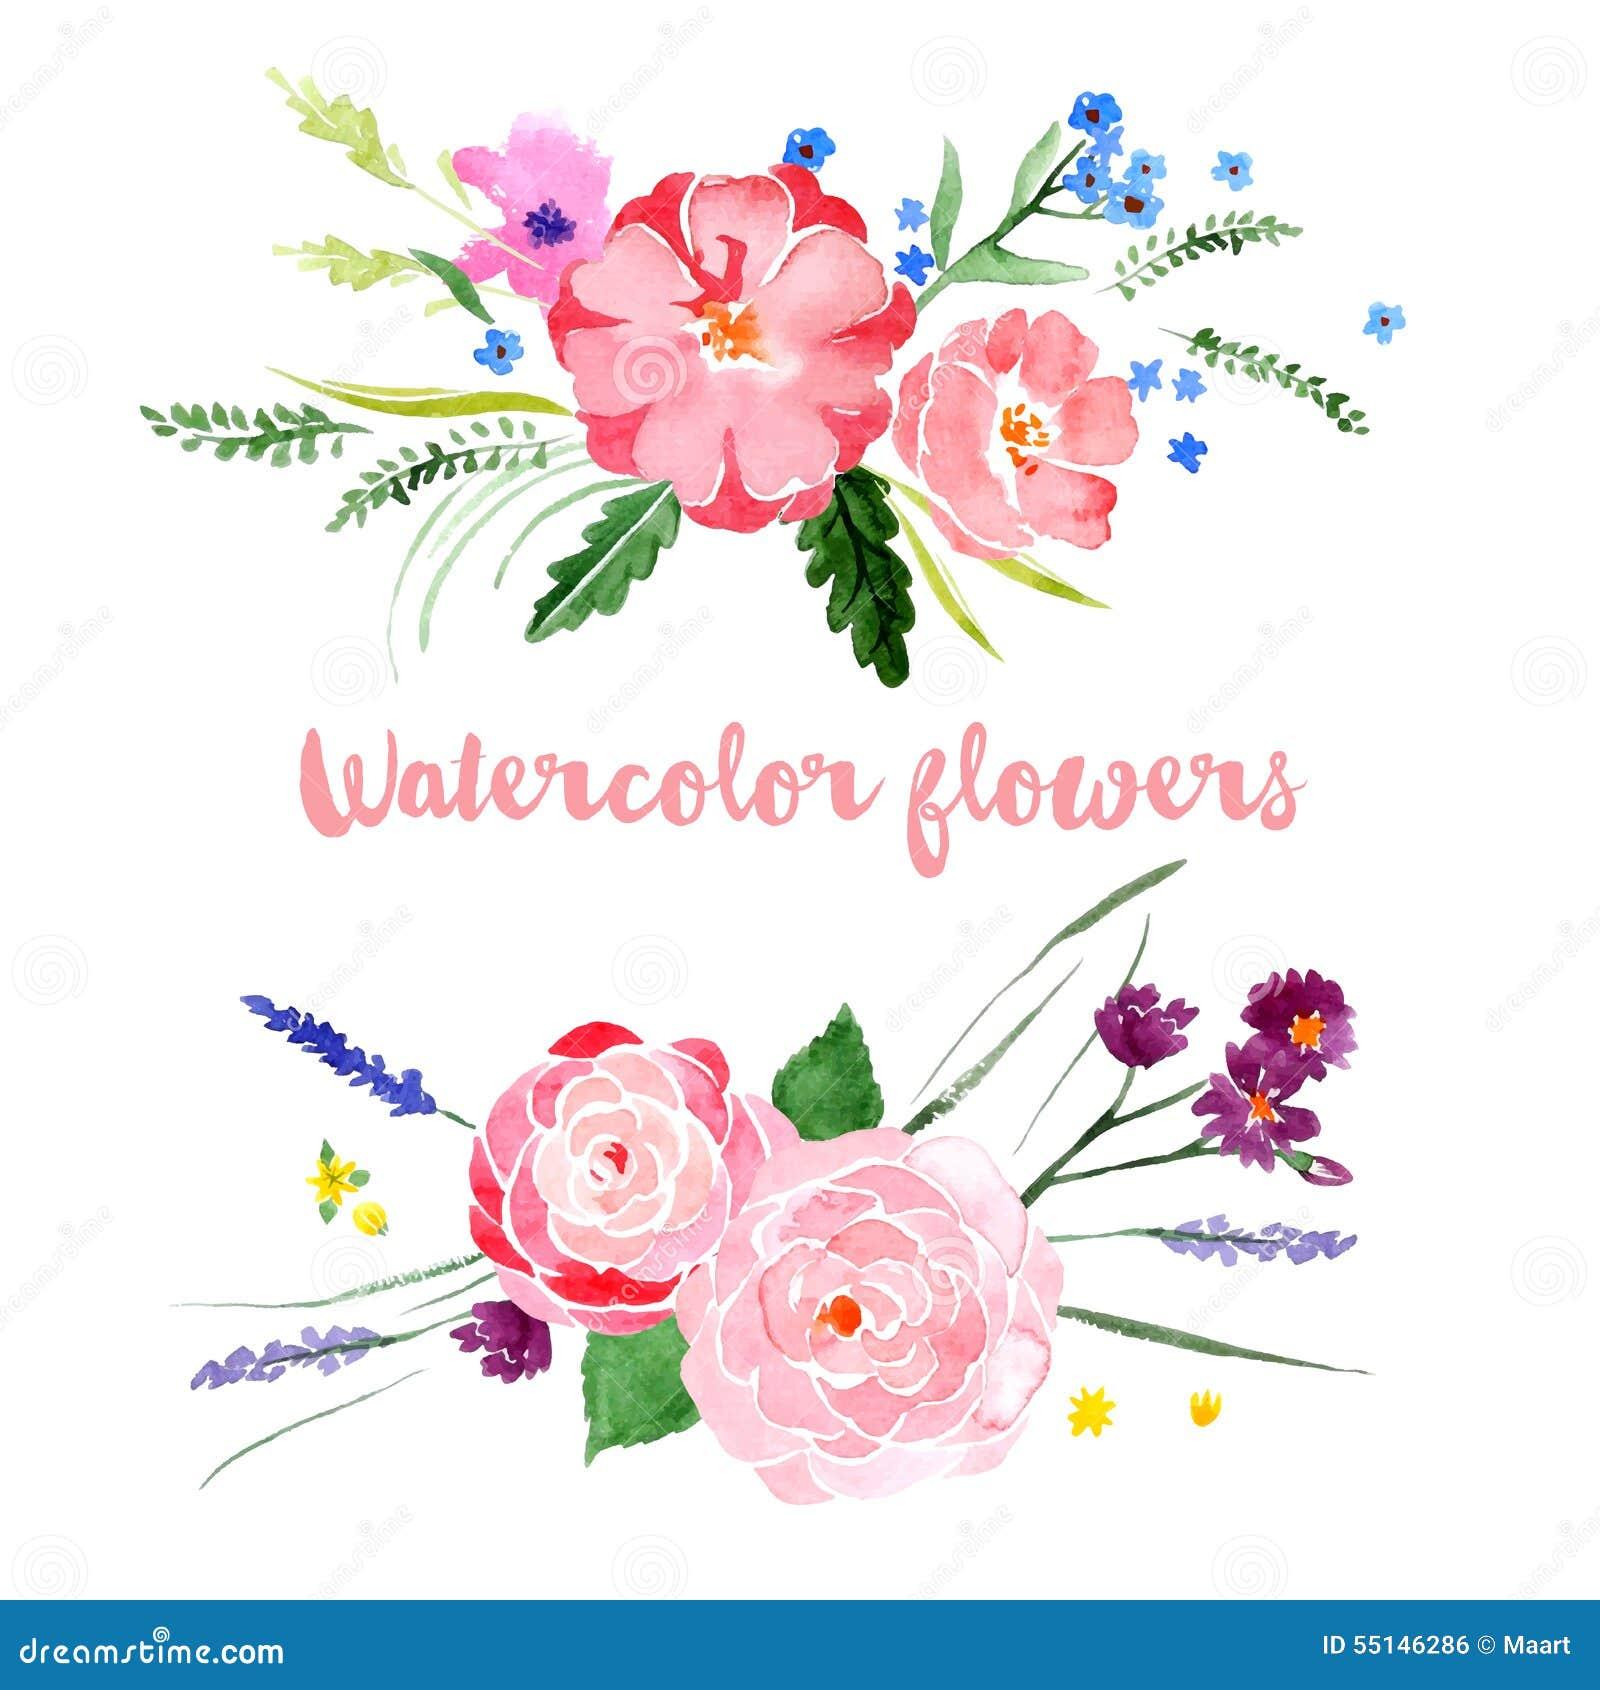 Watercolor floral borders